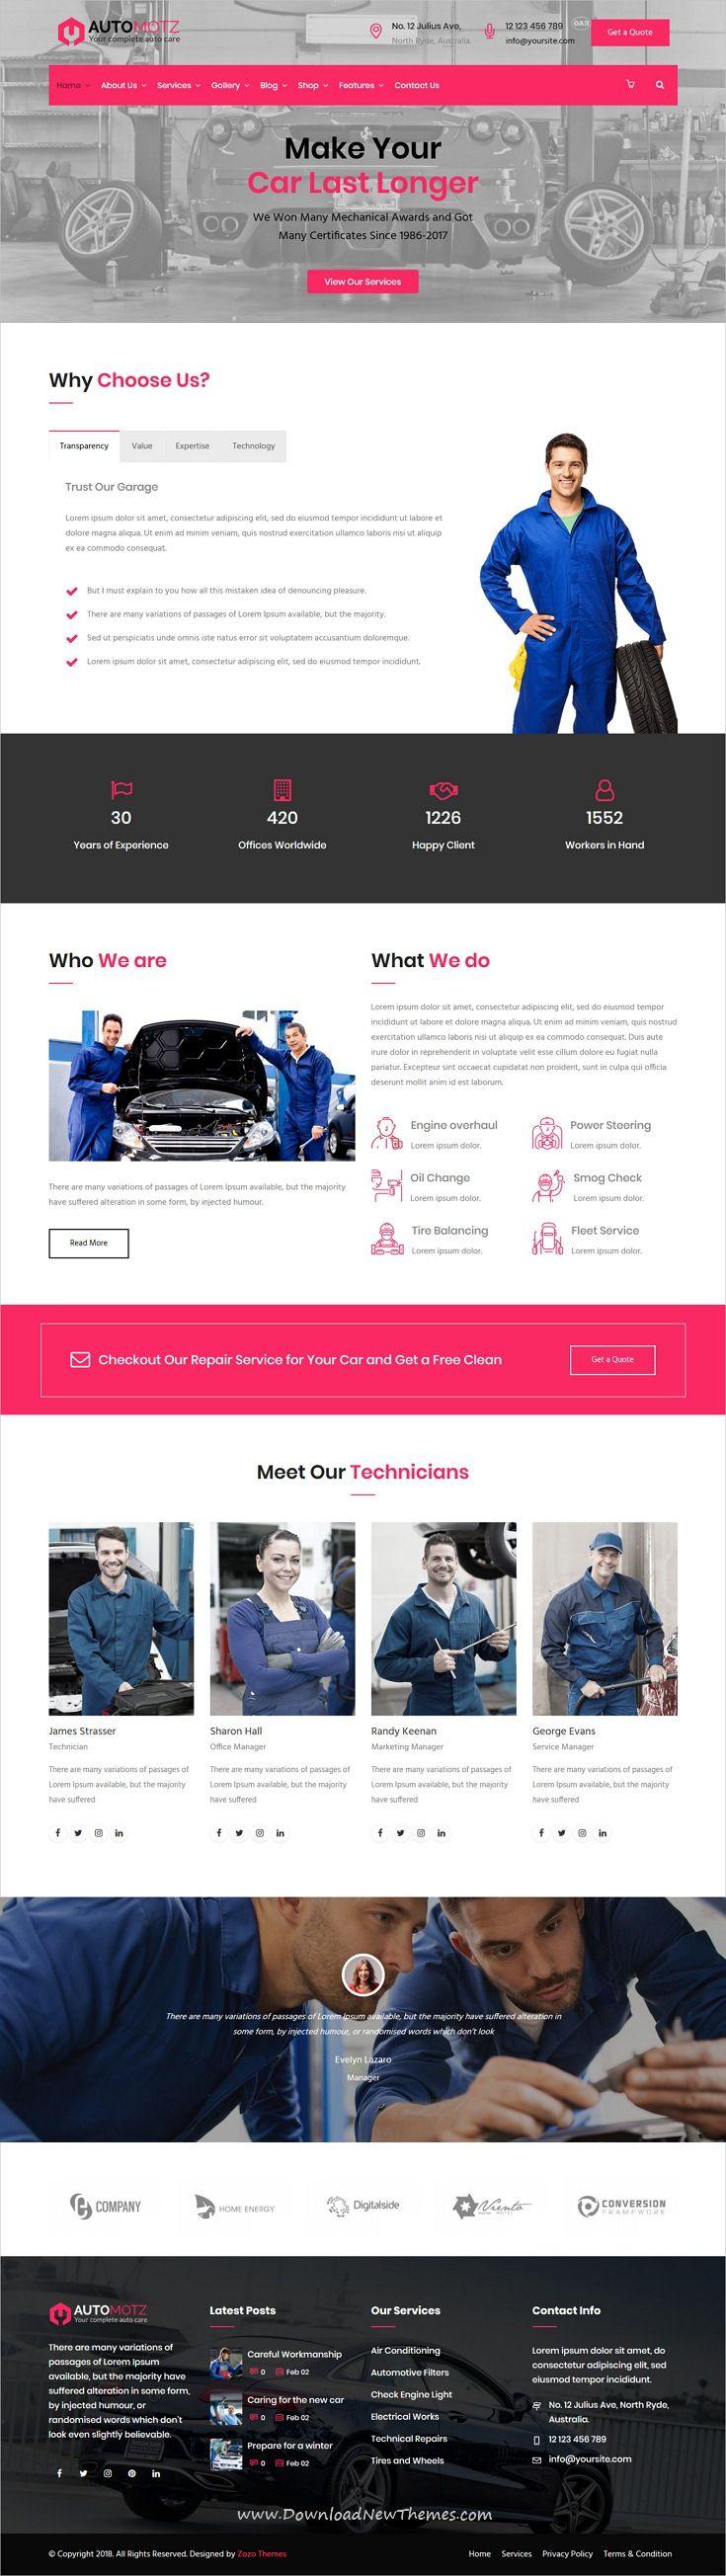 Automotz Auto Repair Services Wordpress Theme Car Repair Service Auto Repair Auto Repair Shop